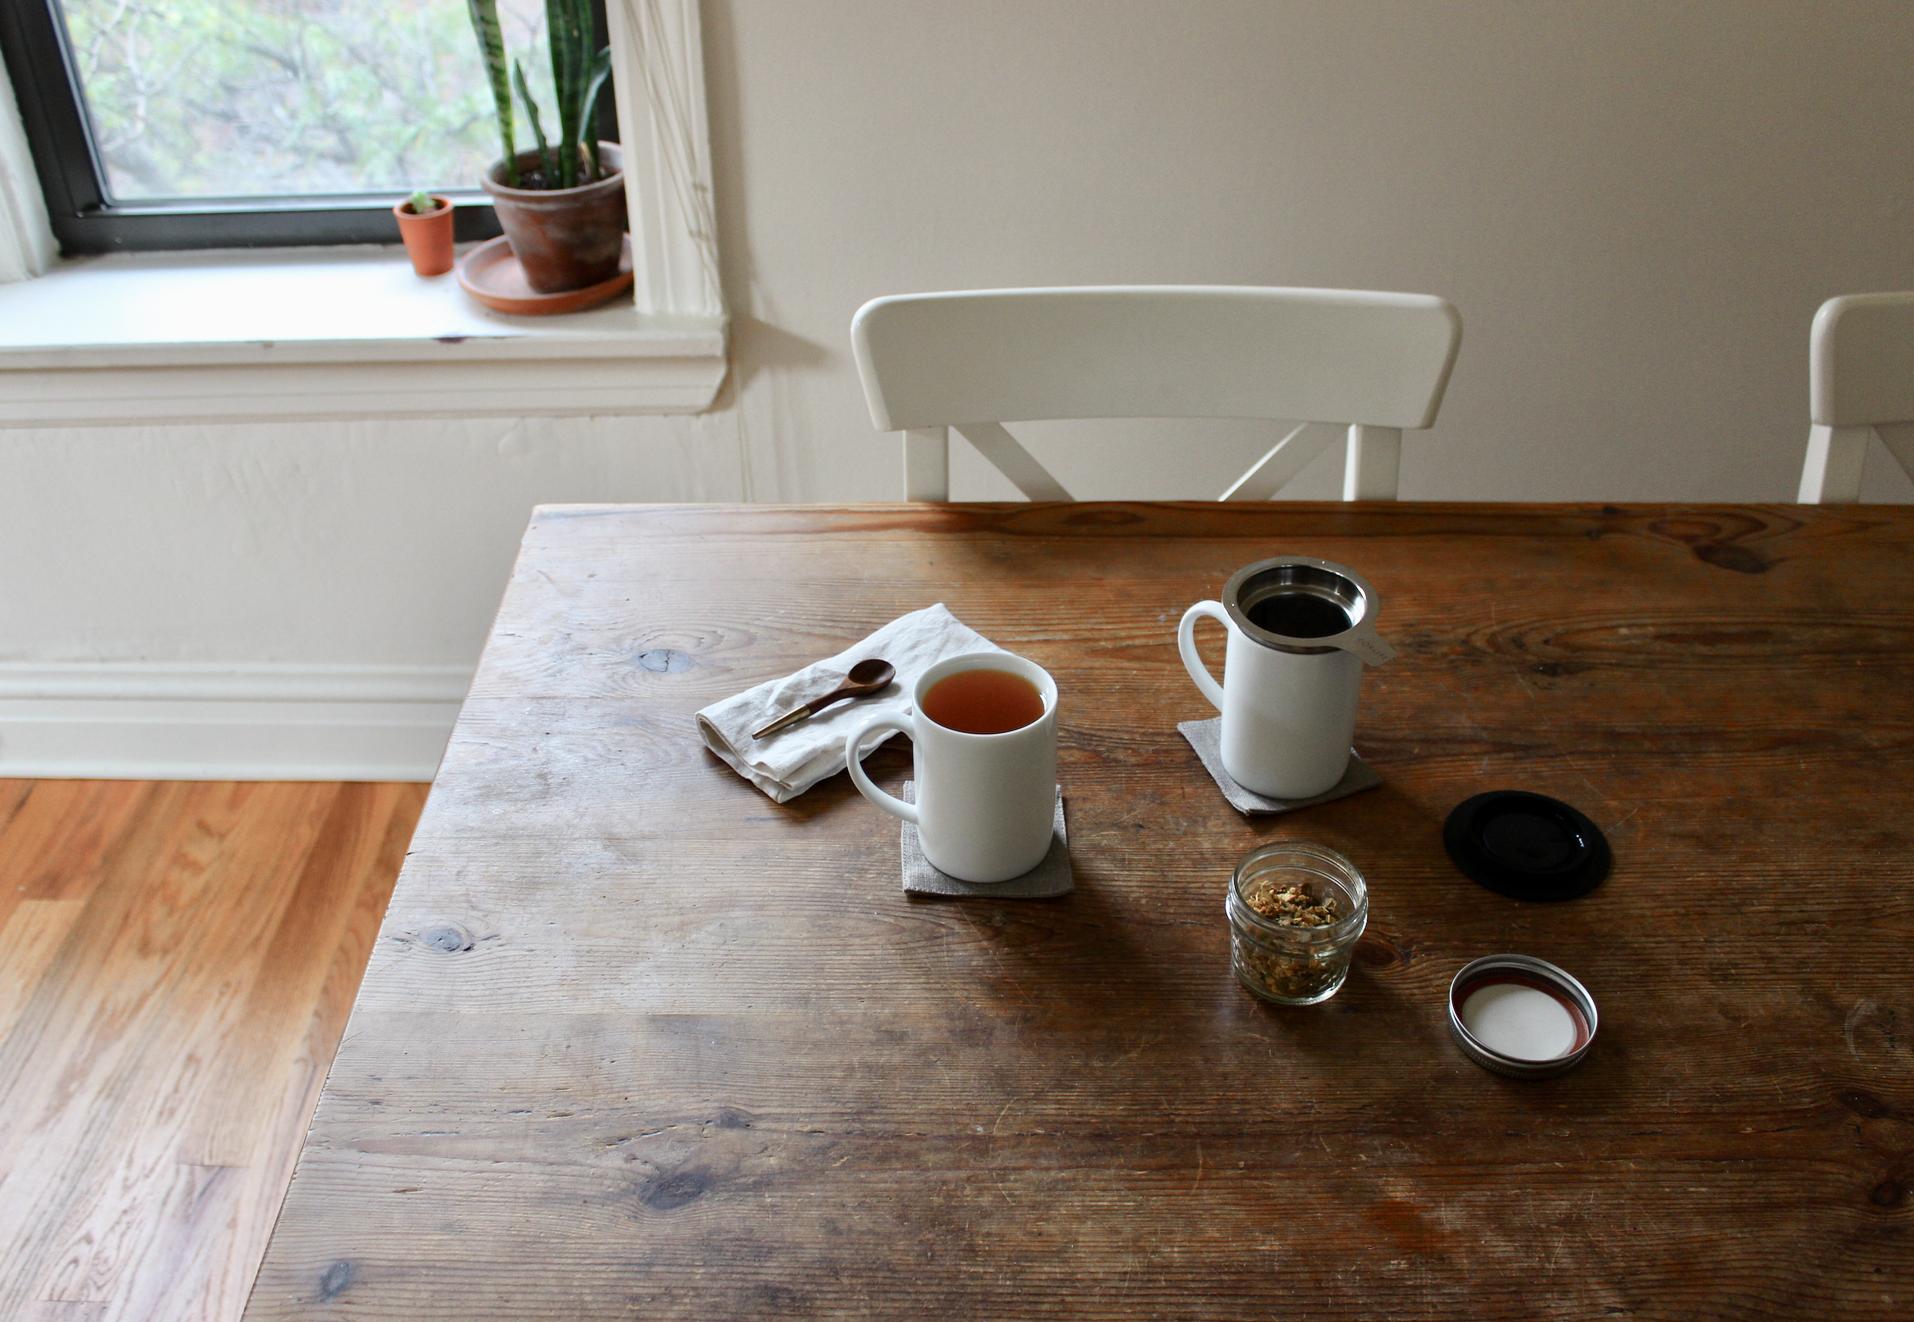 How to brew zero waste loose leaf tea | Litterless